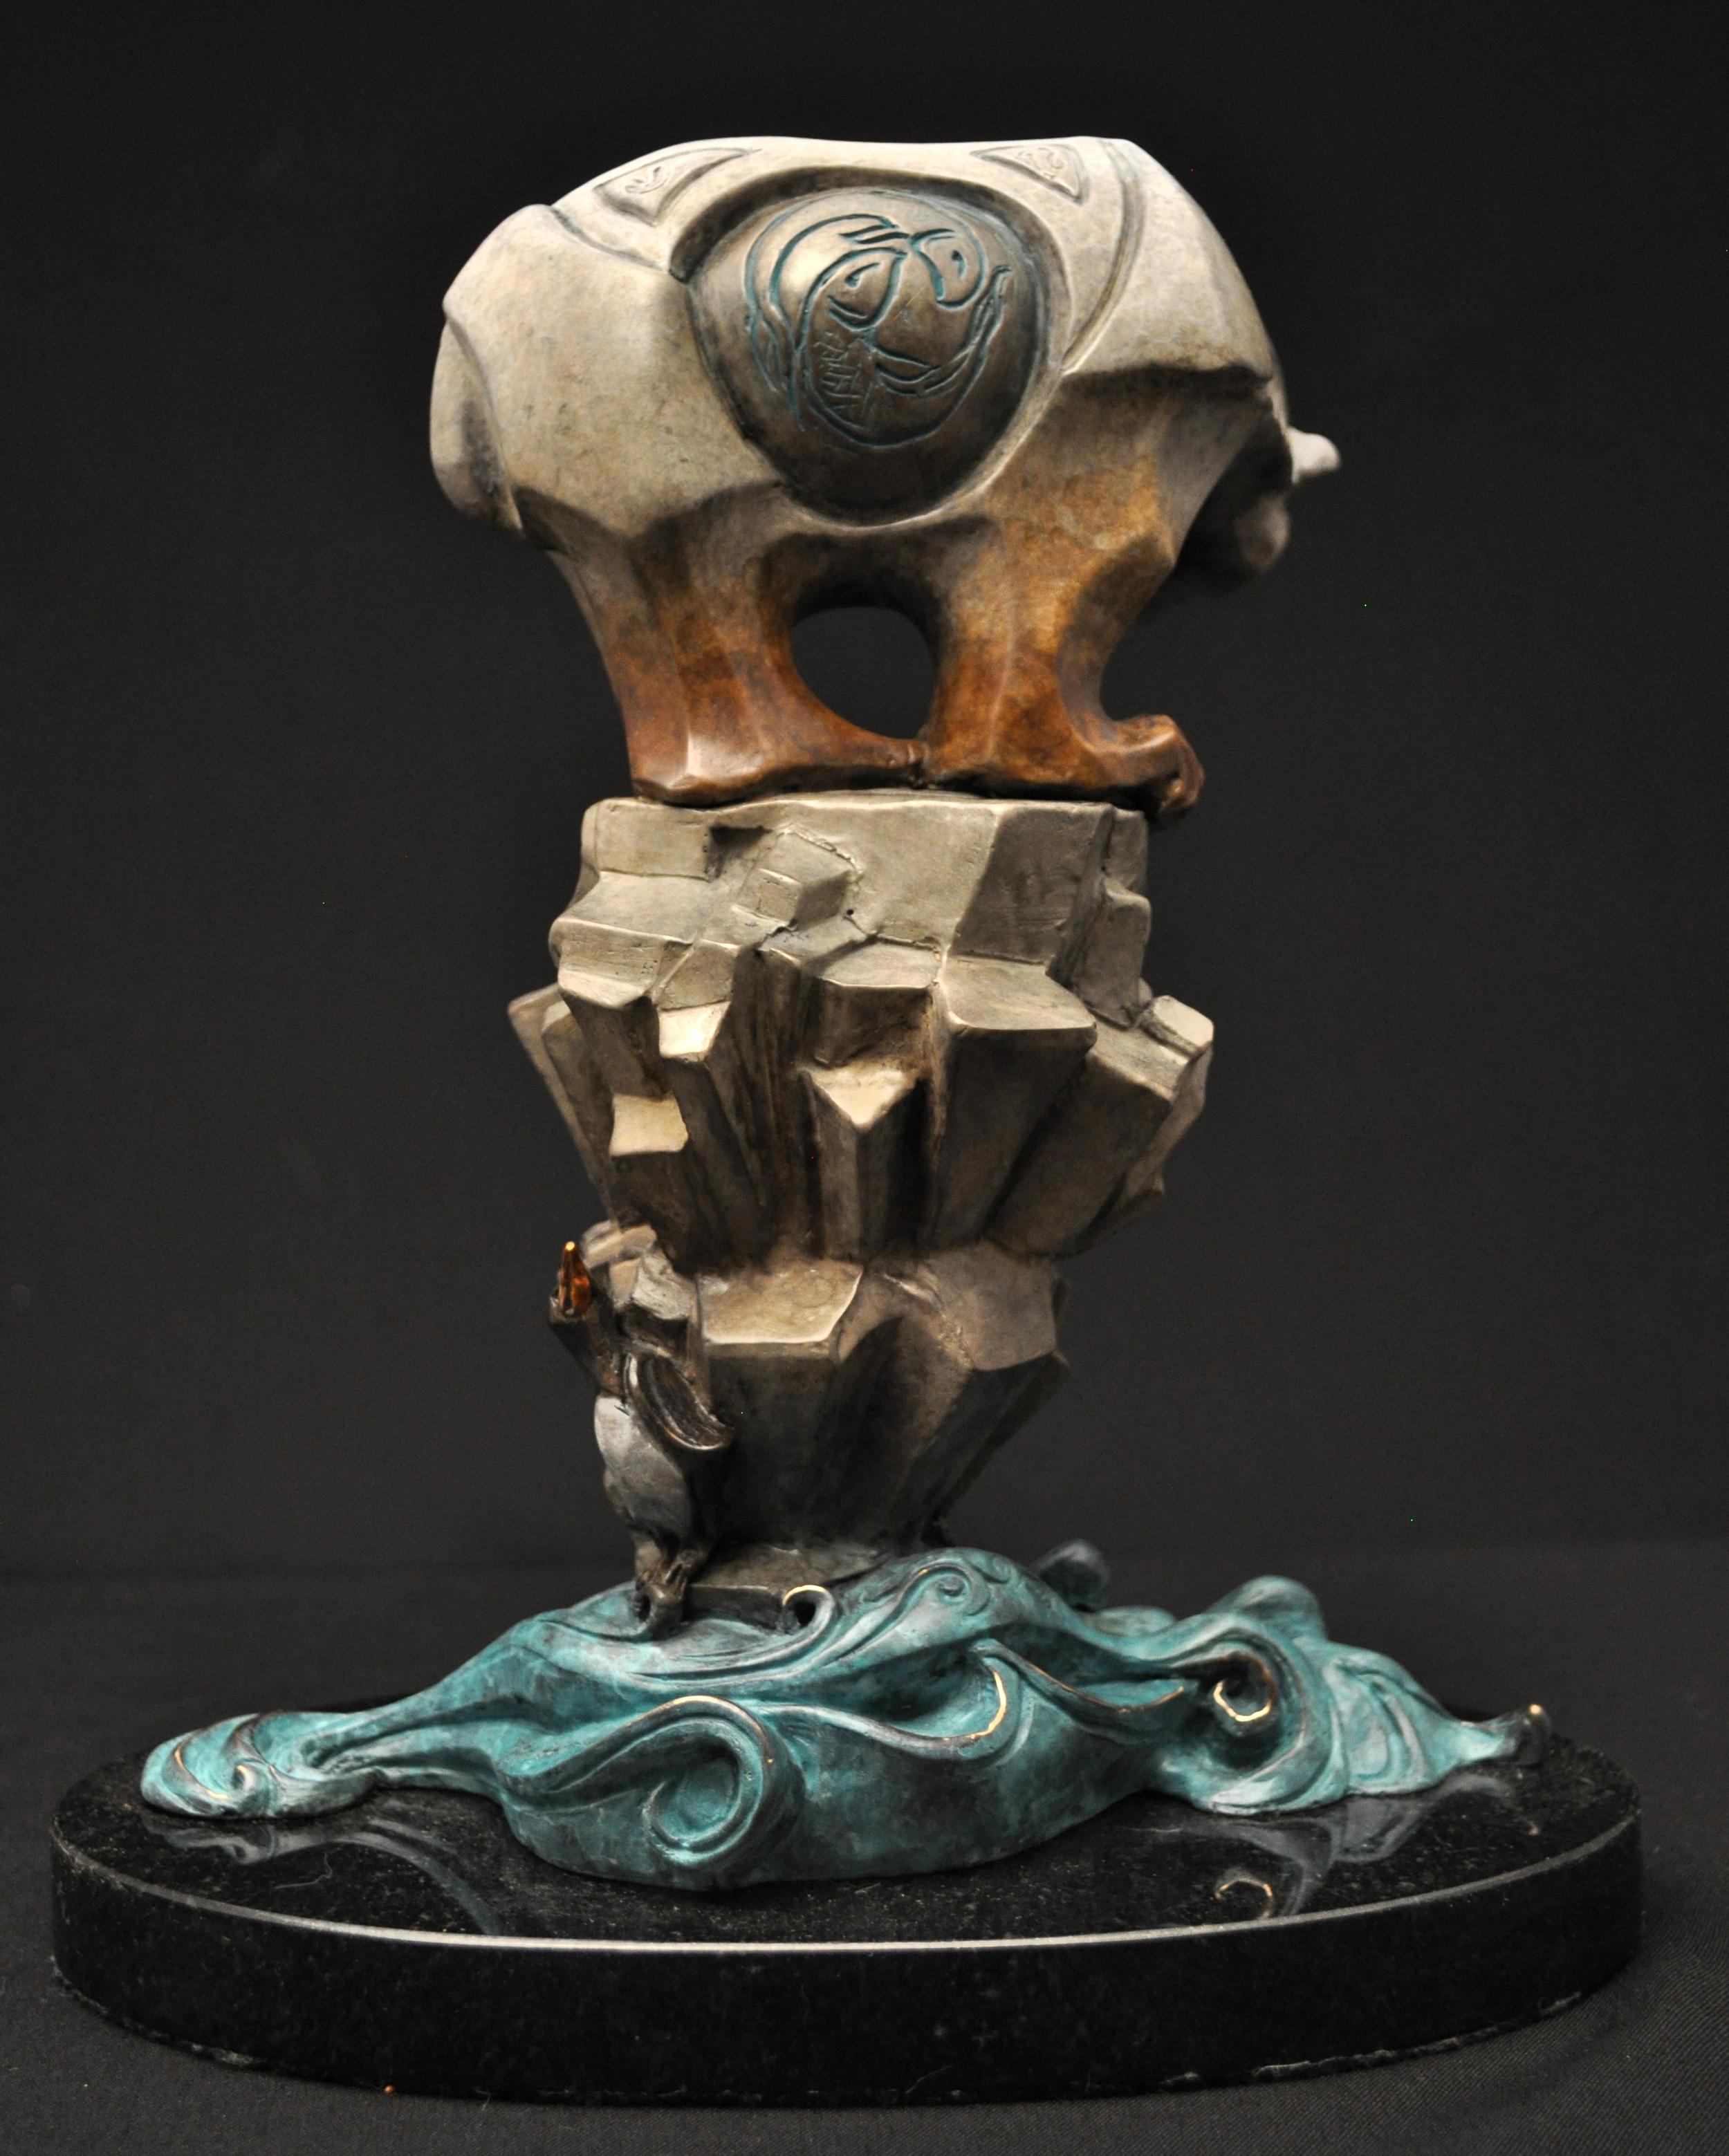 bronze-polar-bear-sculpture-john-maisano-5.jpg